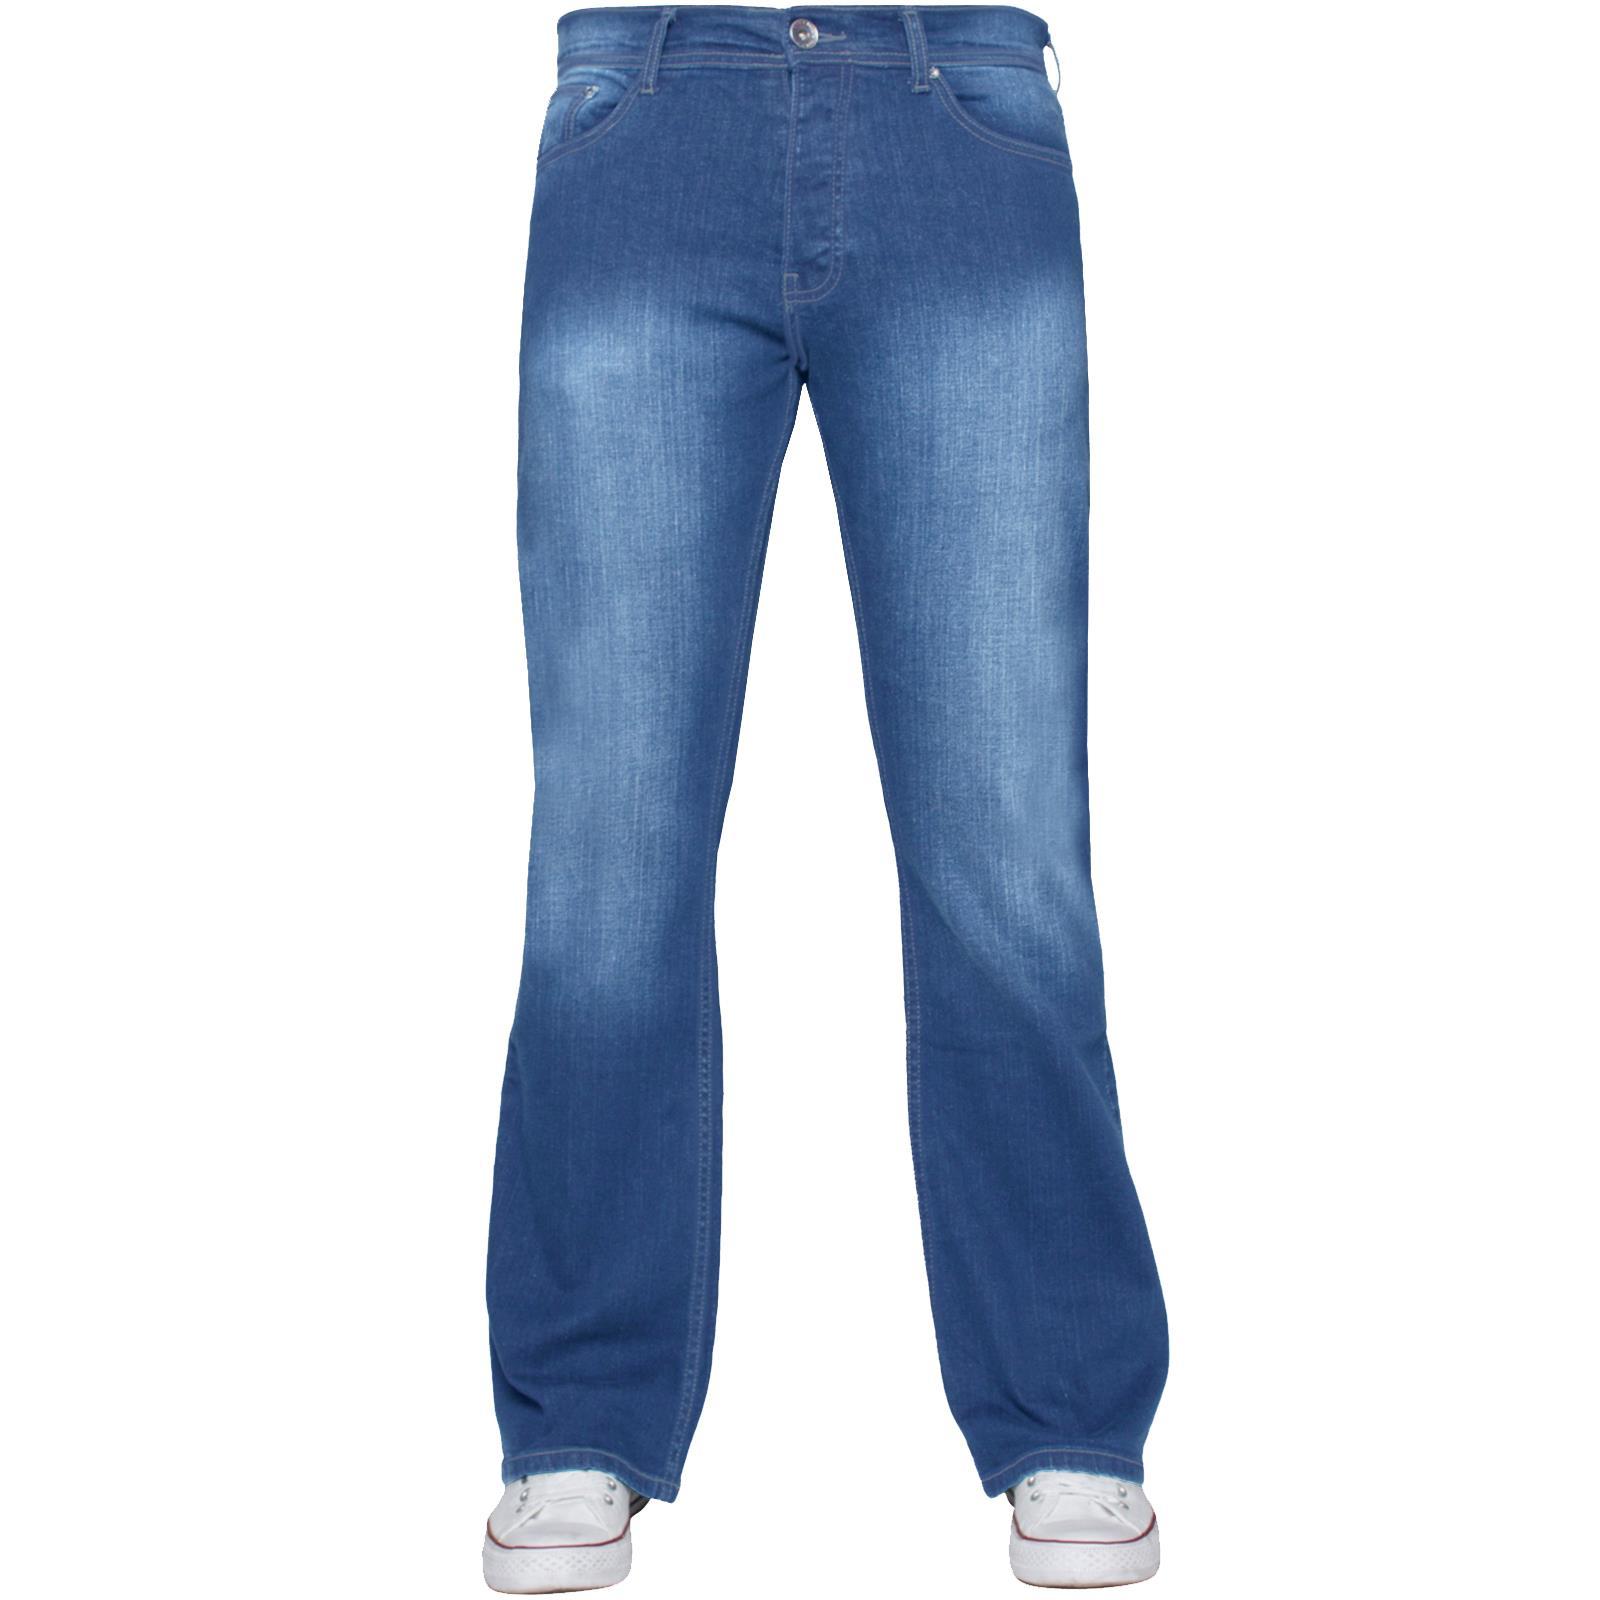 Para-Hombre-Recto-Bootcut-Stretch-Jeans-Pantalones-Regular-Fit-Grande-Alto-Todas-Cinturas miniatura 44